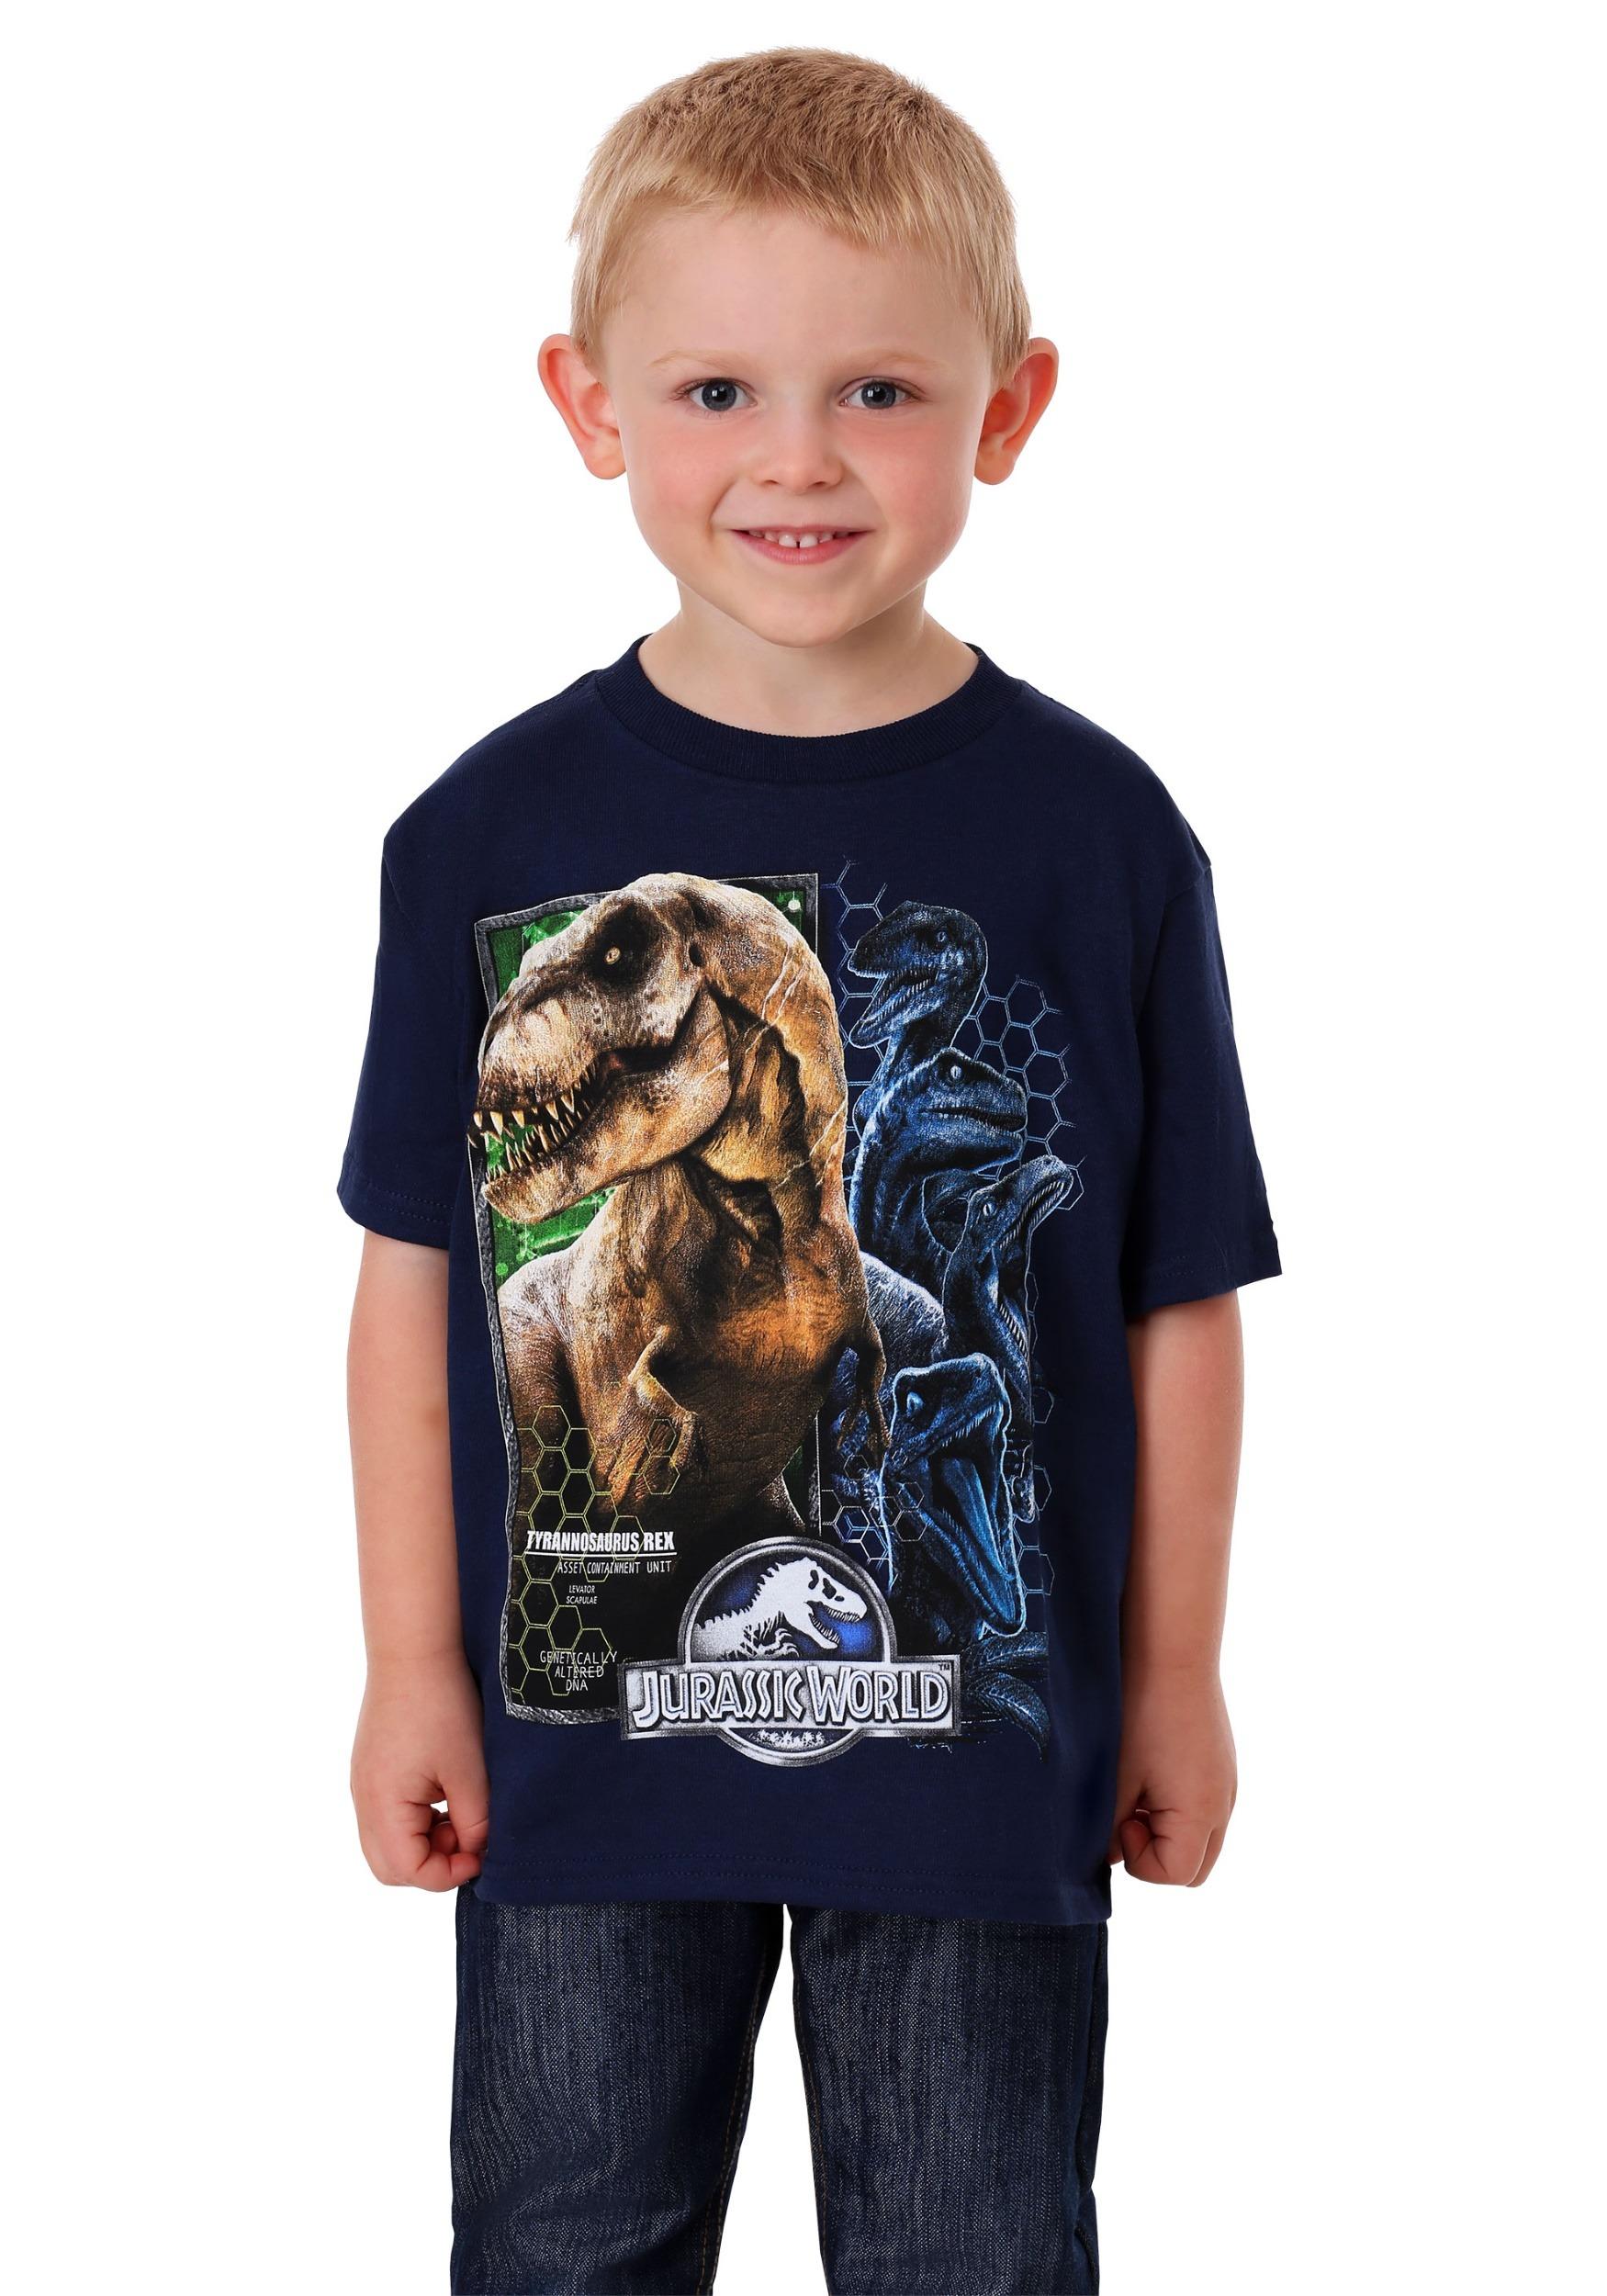 313381c4 Jurassic World Boy's T-Shirt